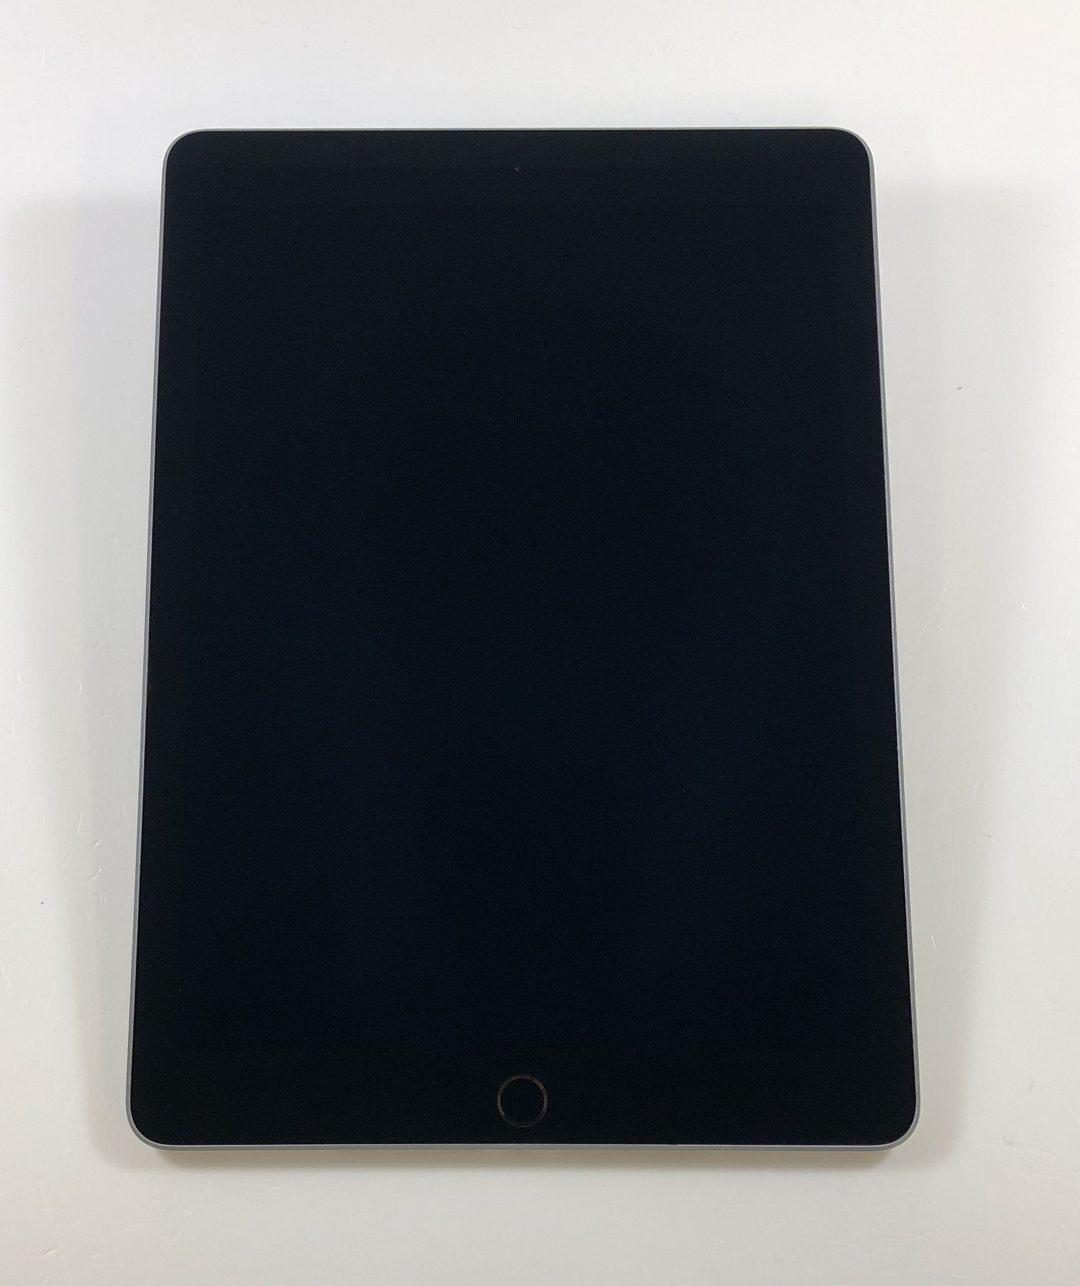 iPad Air 2 Wi-Fi 64GB, 64GB, Space Gray, imagen 1